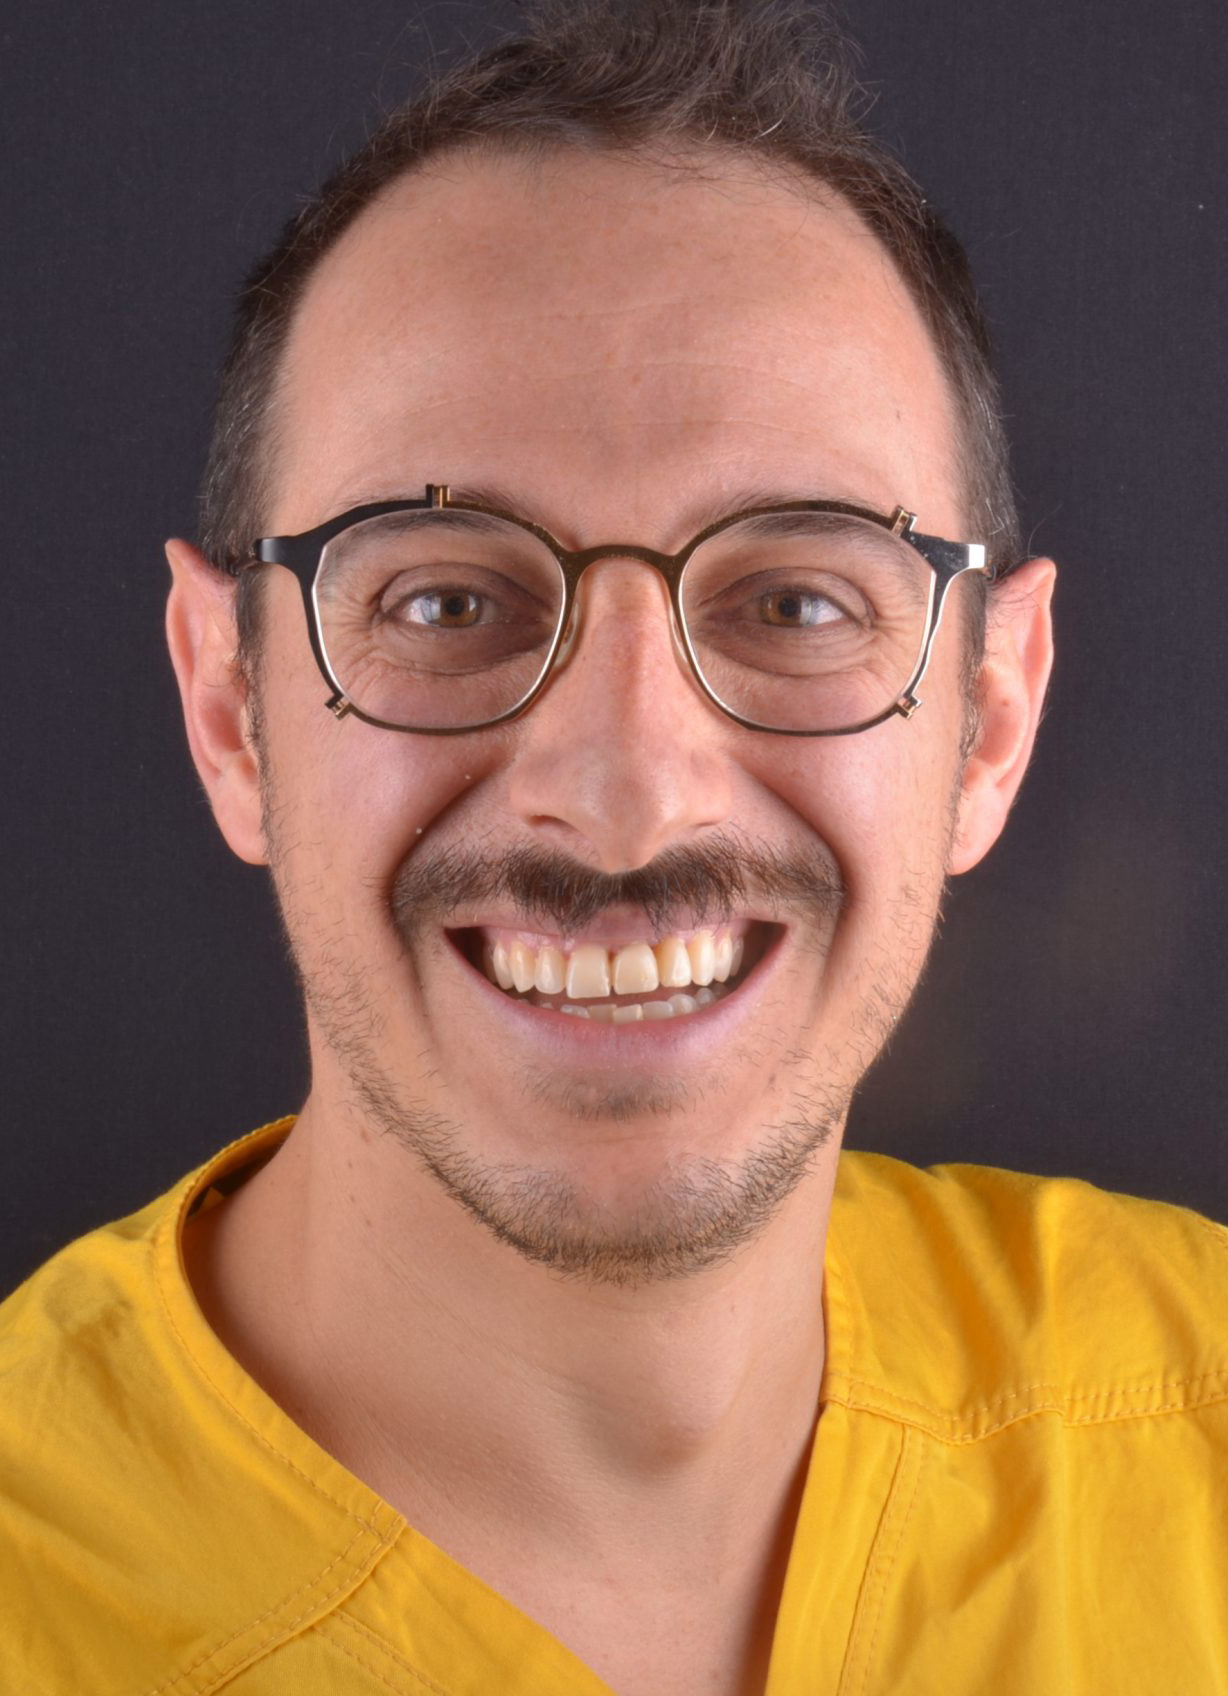 Prof. Dr. Nicola Scotti, D.D.S PhD